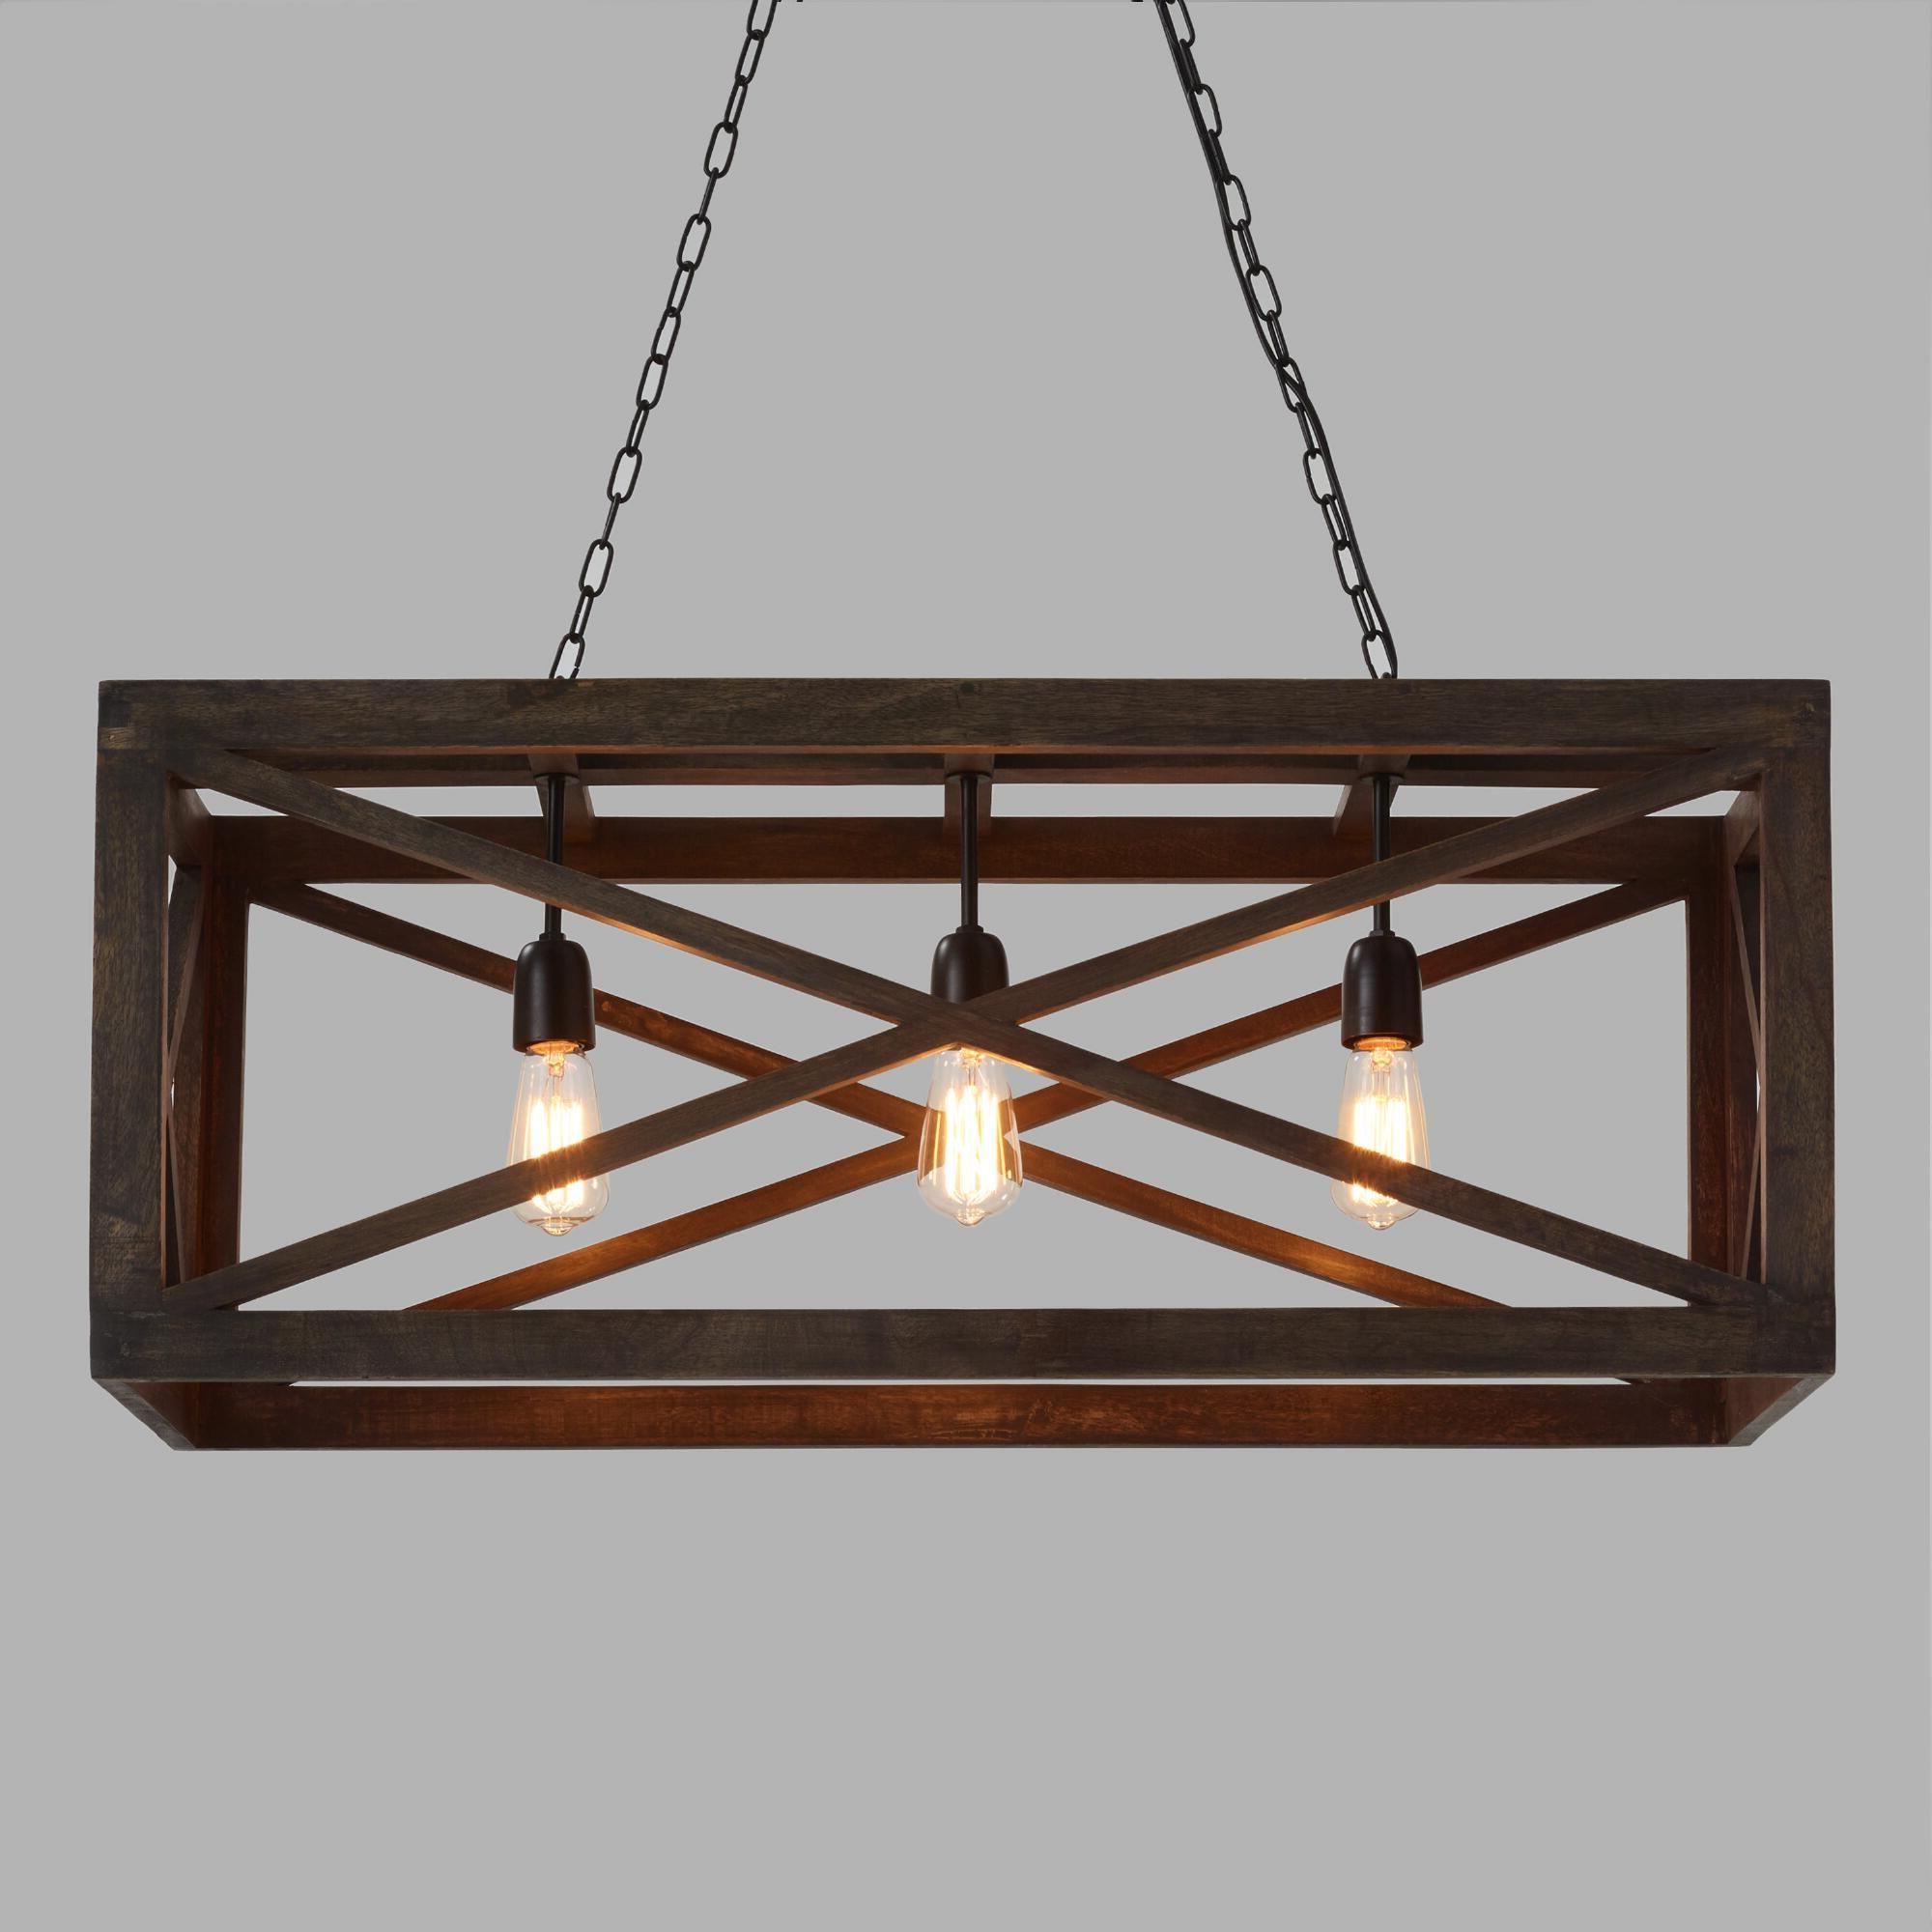 Ellenton 4 Light Rectangle Chandeliers Regarding 2019 Rectangular Gray Wood 3 Light Valencia Chandelierworld (View 8 of 20)